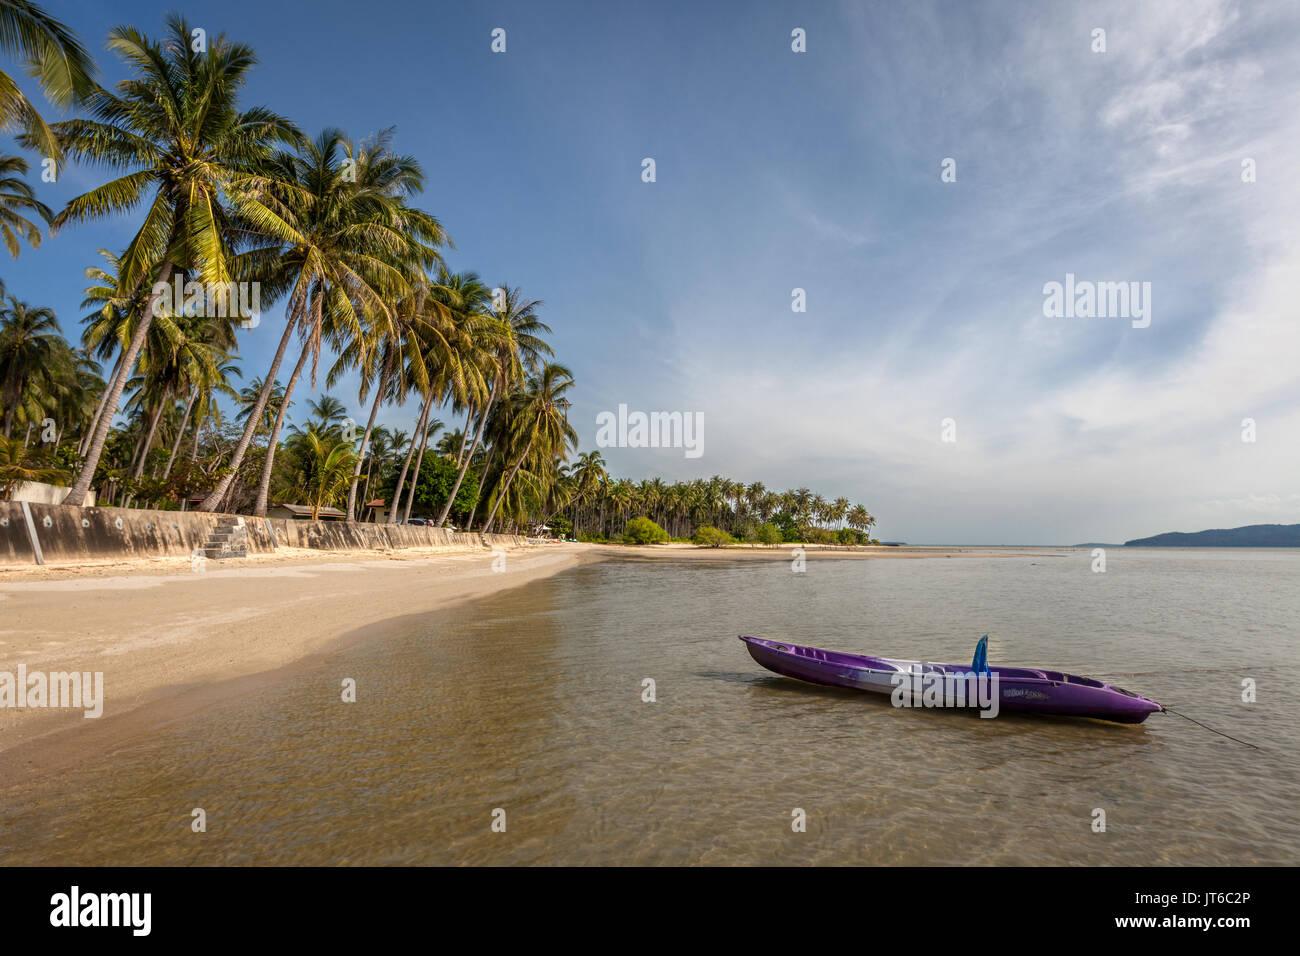 Thong Krut Beach, Koh Samui, Thailand Stockbild